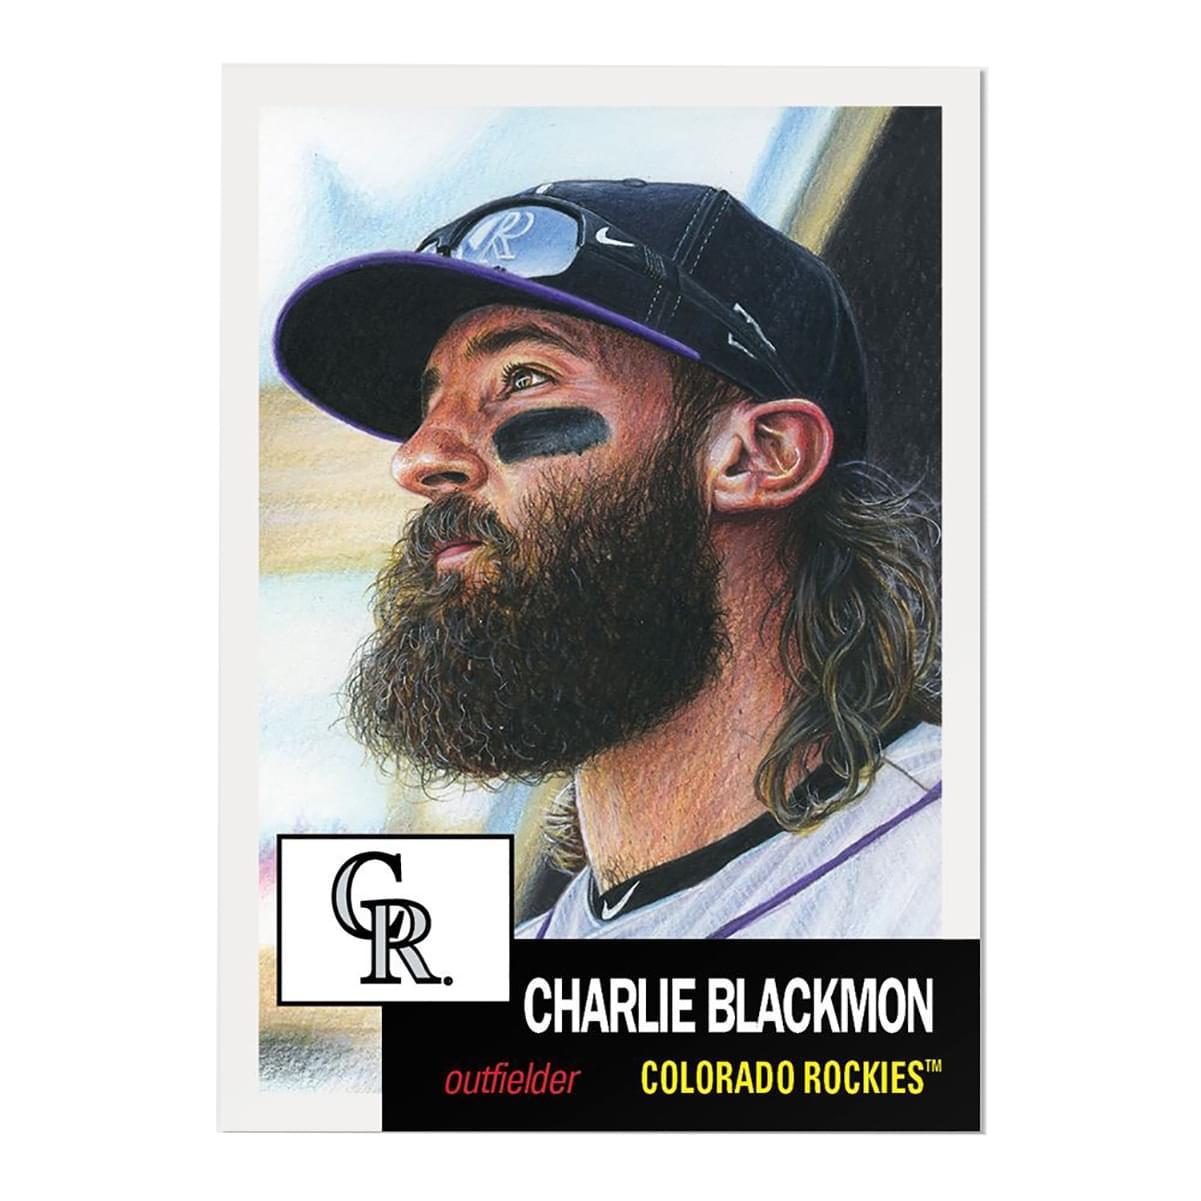 Colorado Rockies #31 Charlie Blackmon MLB Topps Living Set Card